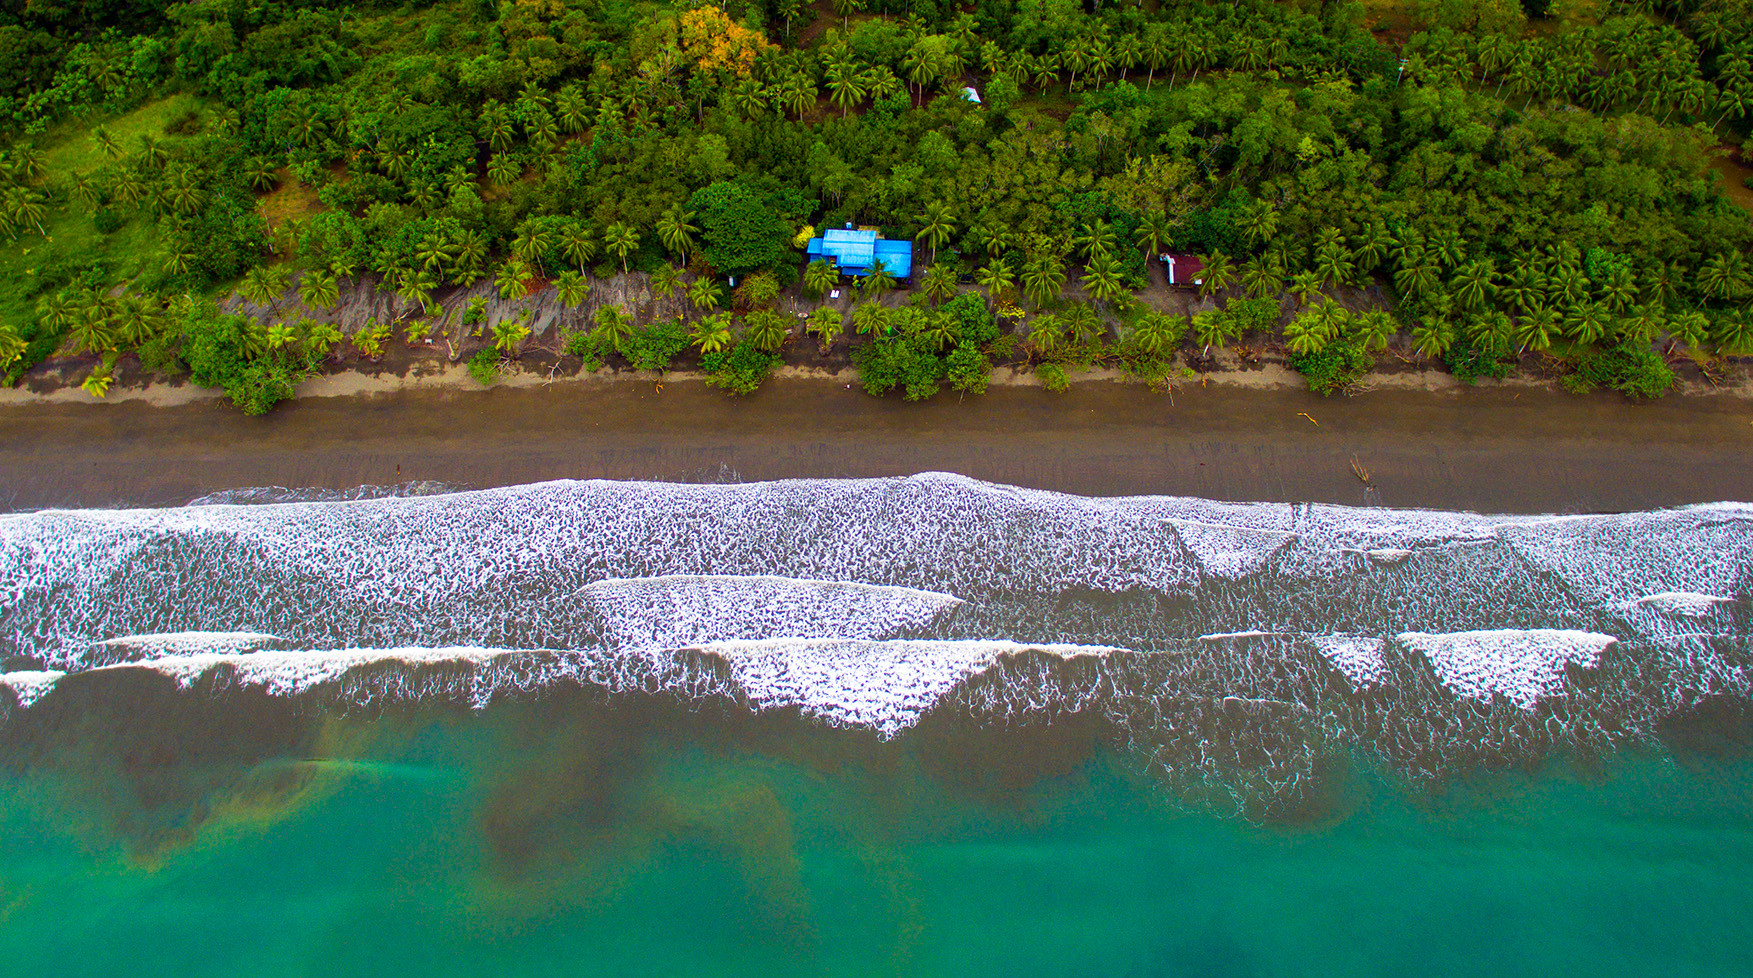 Vista aerea Mecana Ecohotel Bahia Solano